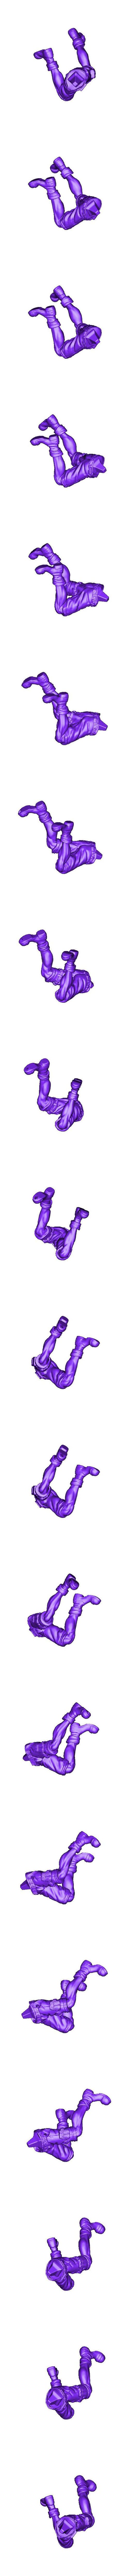 PART 3.stl Download STL file Portgas D. Ace - One Piece 3D printable • 3D print model, ronnie_yonk